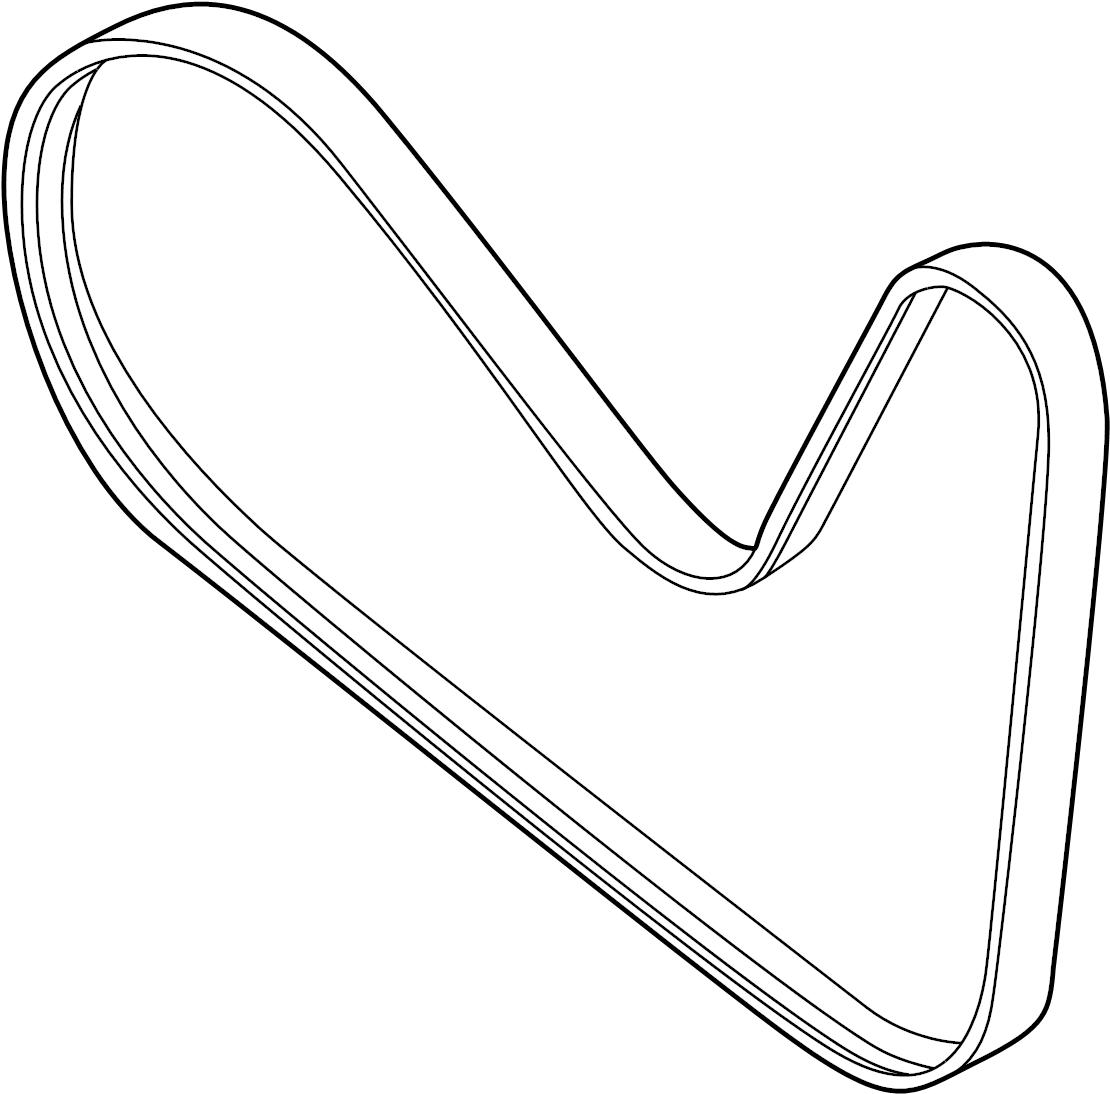 Ford Taurus X Accessory Drive Belt Liter Pulleys Belts